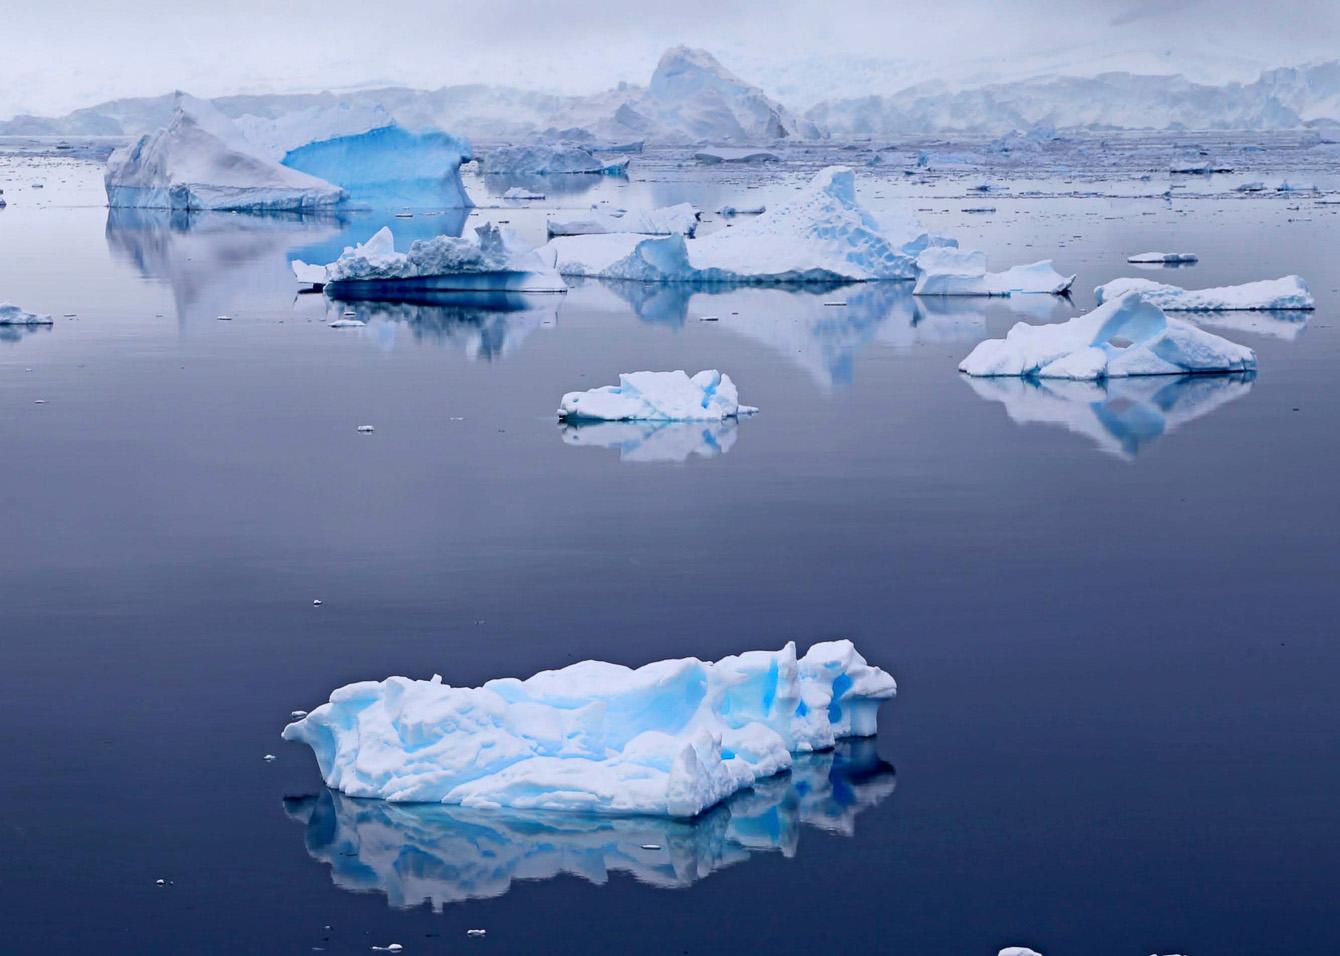 HANSEATIC-Antarktis-Hapag-Lloyd-Cruises-21